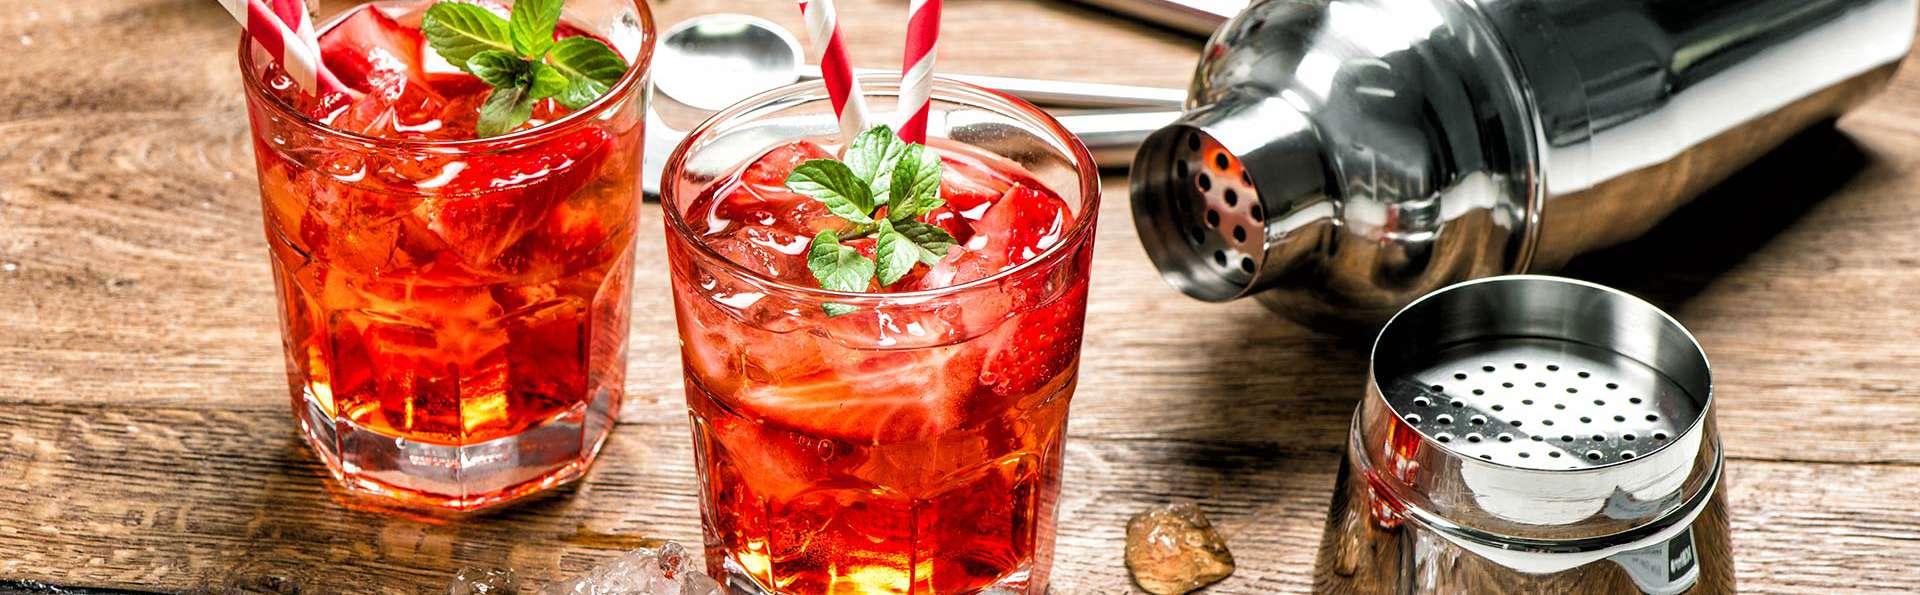 Oolderhof Hotel & Restaurant - EDIT_NEW_ALCOHOLIC-DRINKS_18.jpg